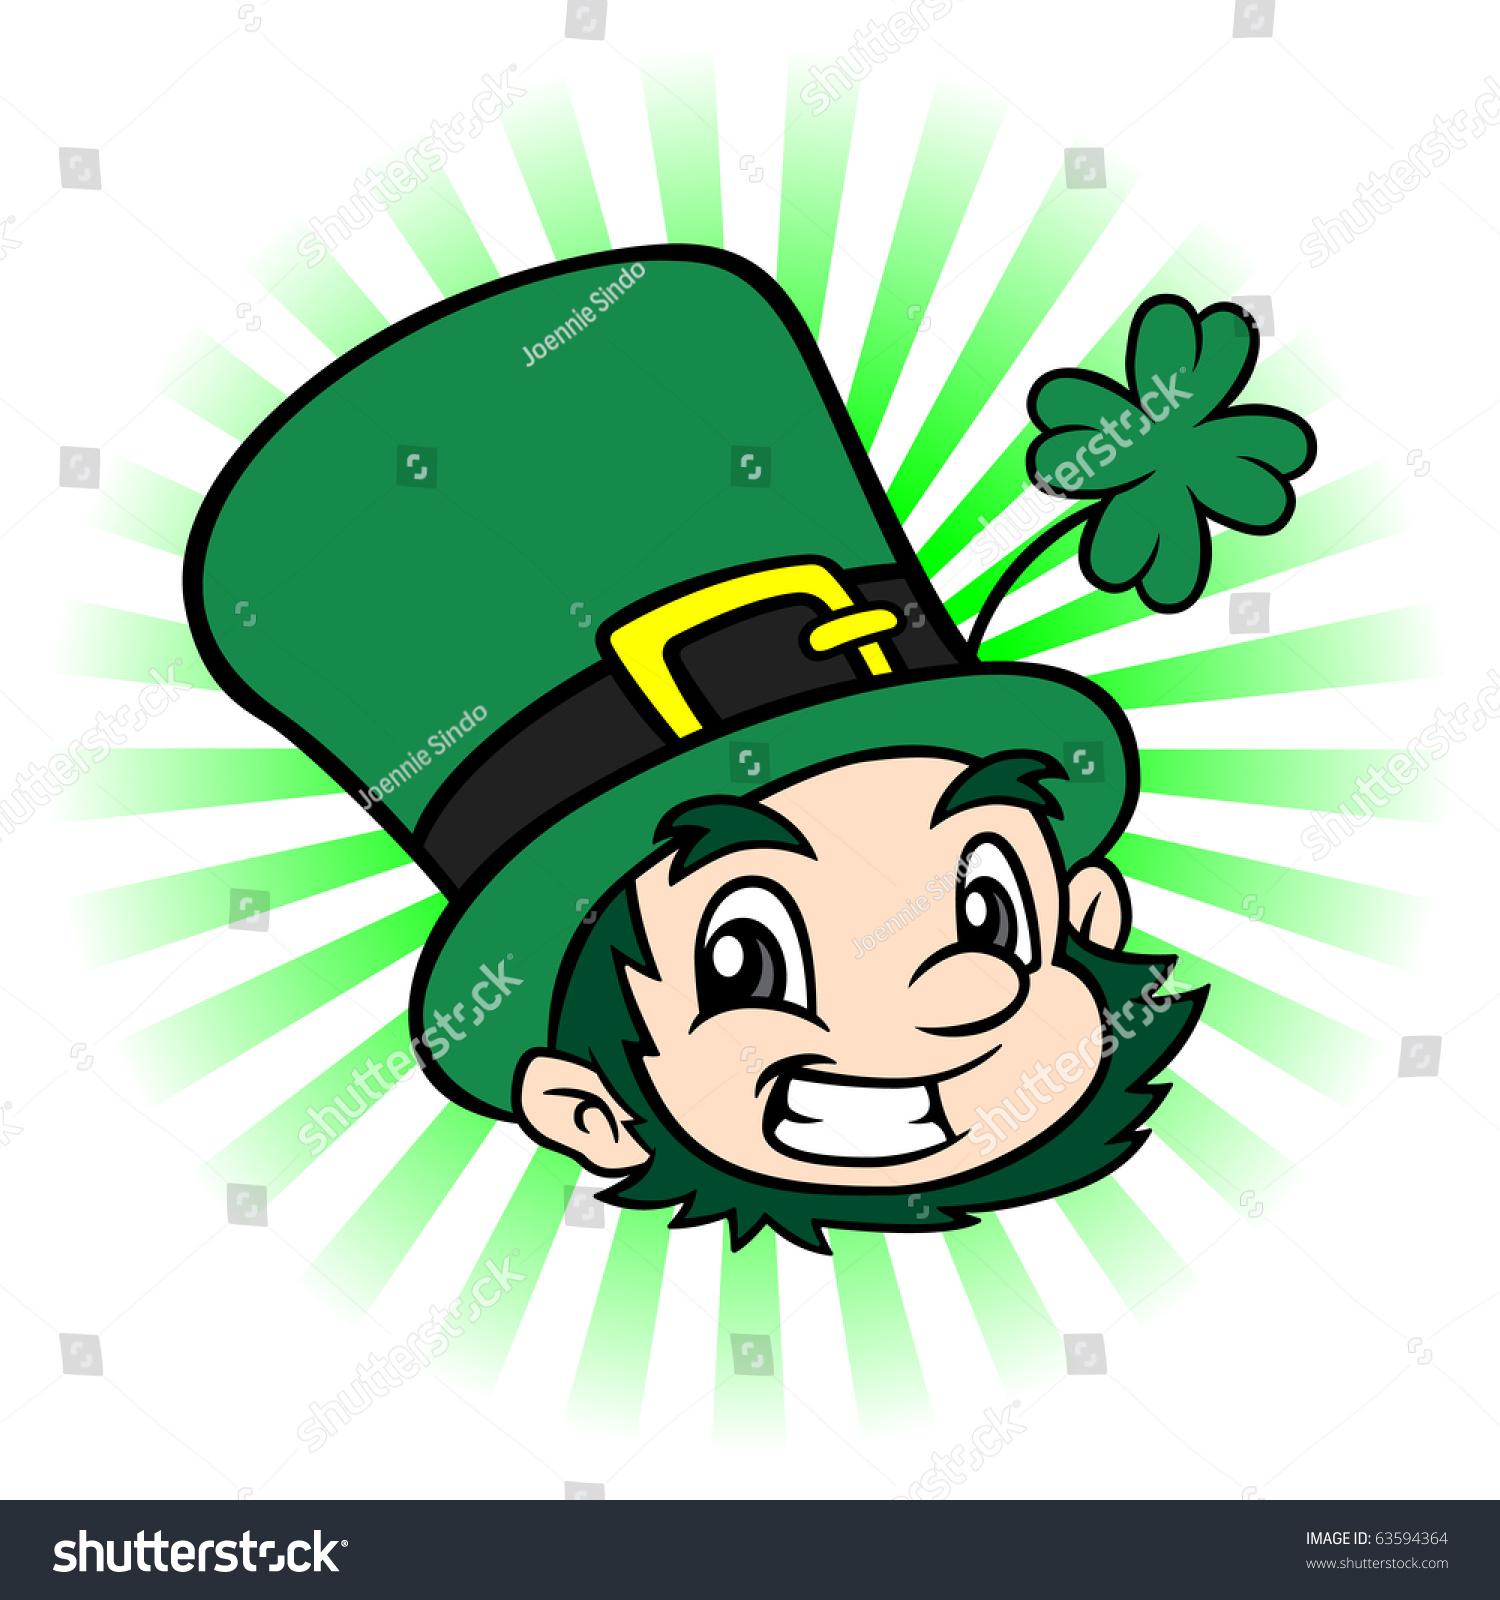 cartoon illustration st patricks day leprechauns stock illustration